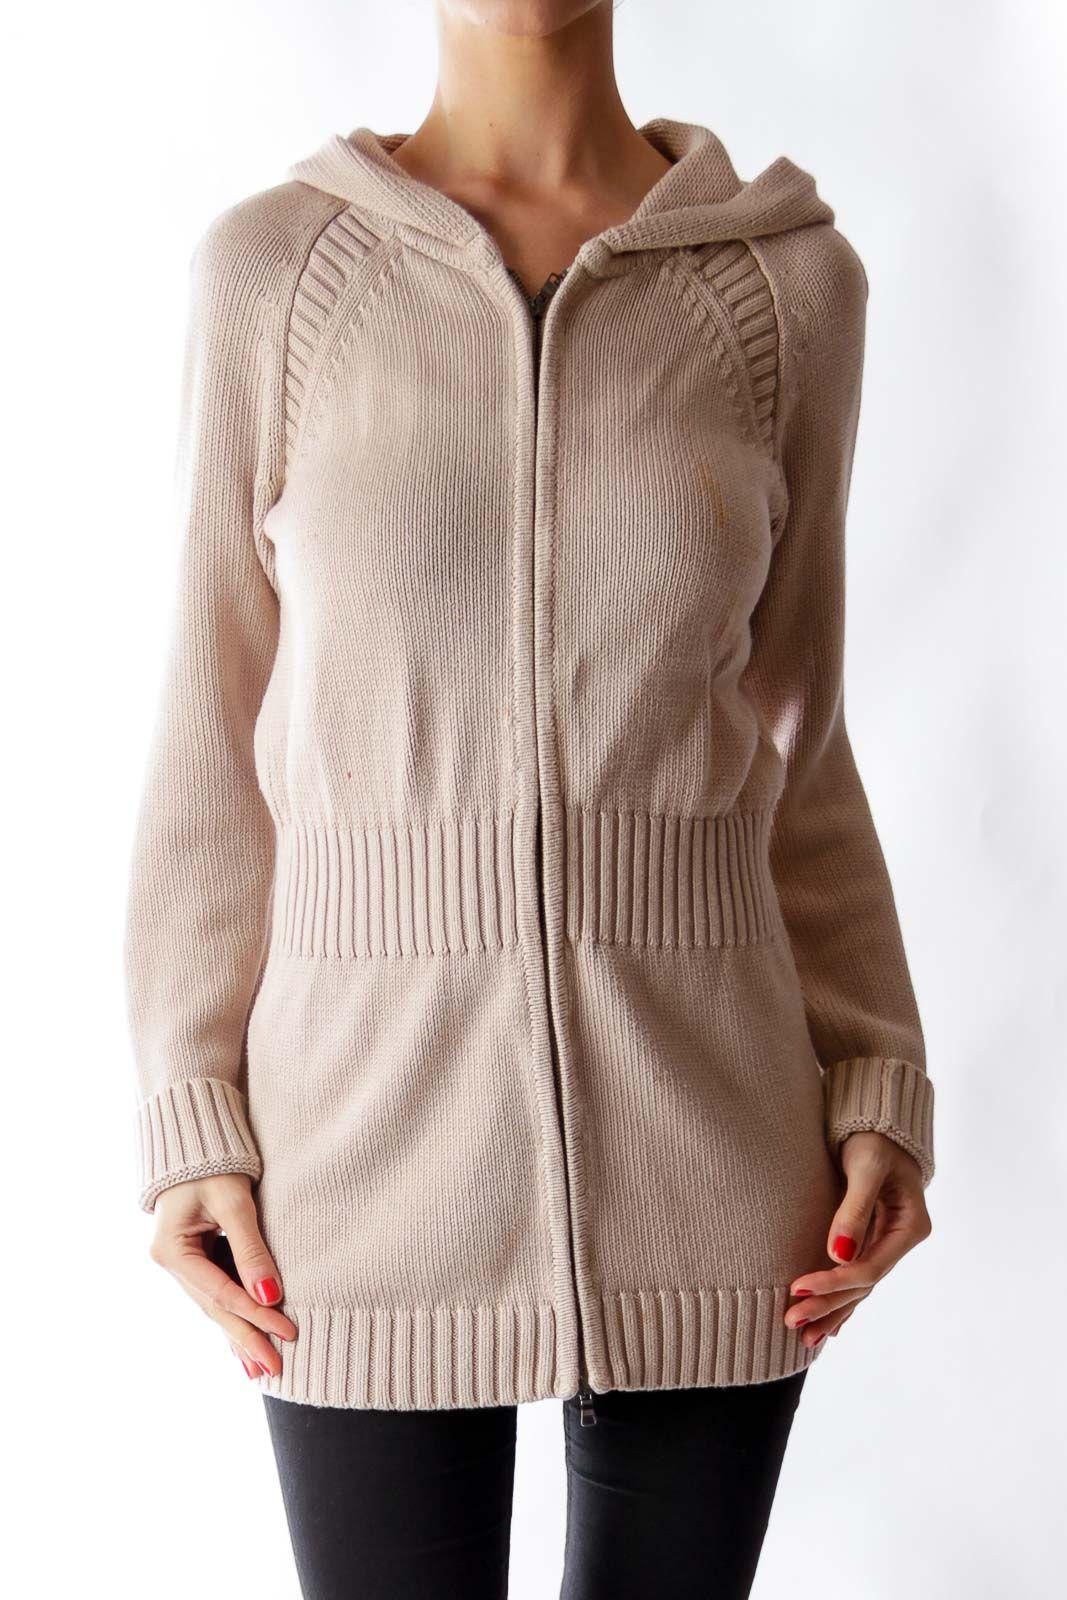 Like this Armani Exchange cardigan? Shop this without using money! Trade. Shop. Discover. #fashionexchange #prelovedfashion  Beige Hoodie Cardigan by Armani Exchange